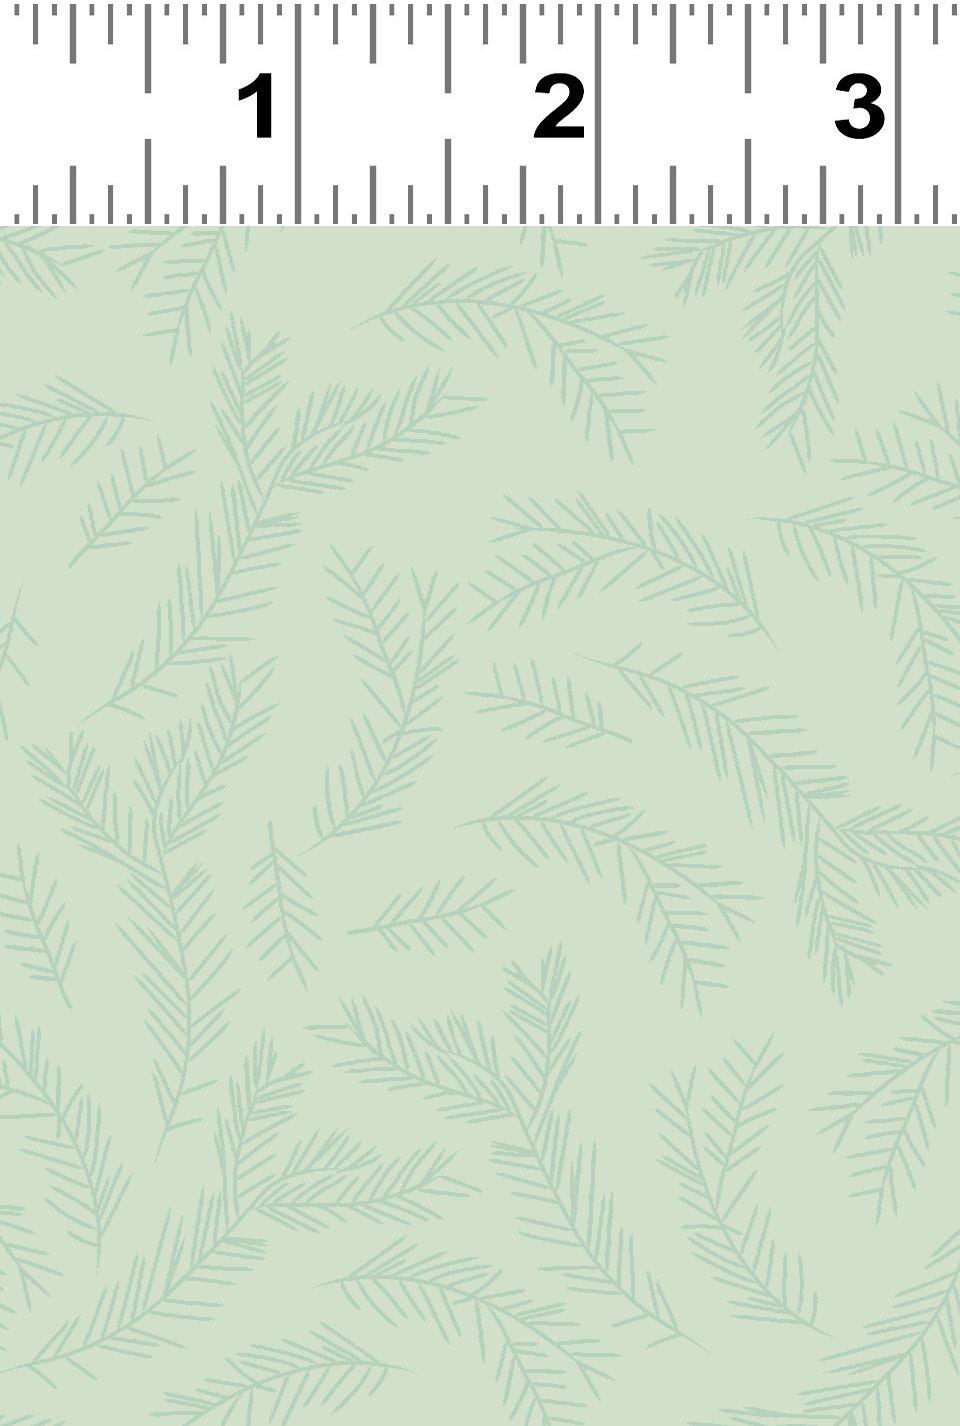 Yuletide Pine Boughs Y3286-109 Light Mint